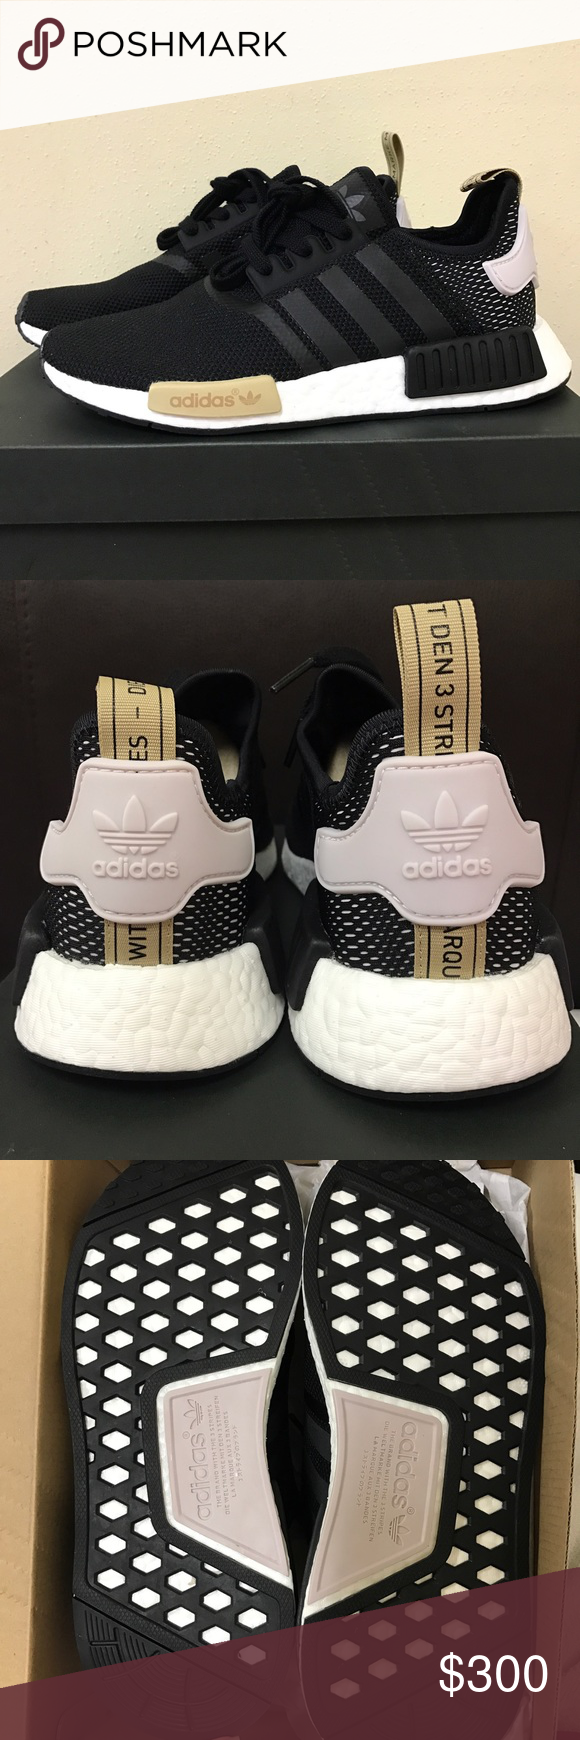 Fashion Adidas Shoes on | Adidas shoes, Adidas sneakers